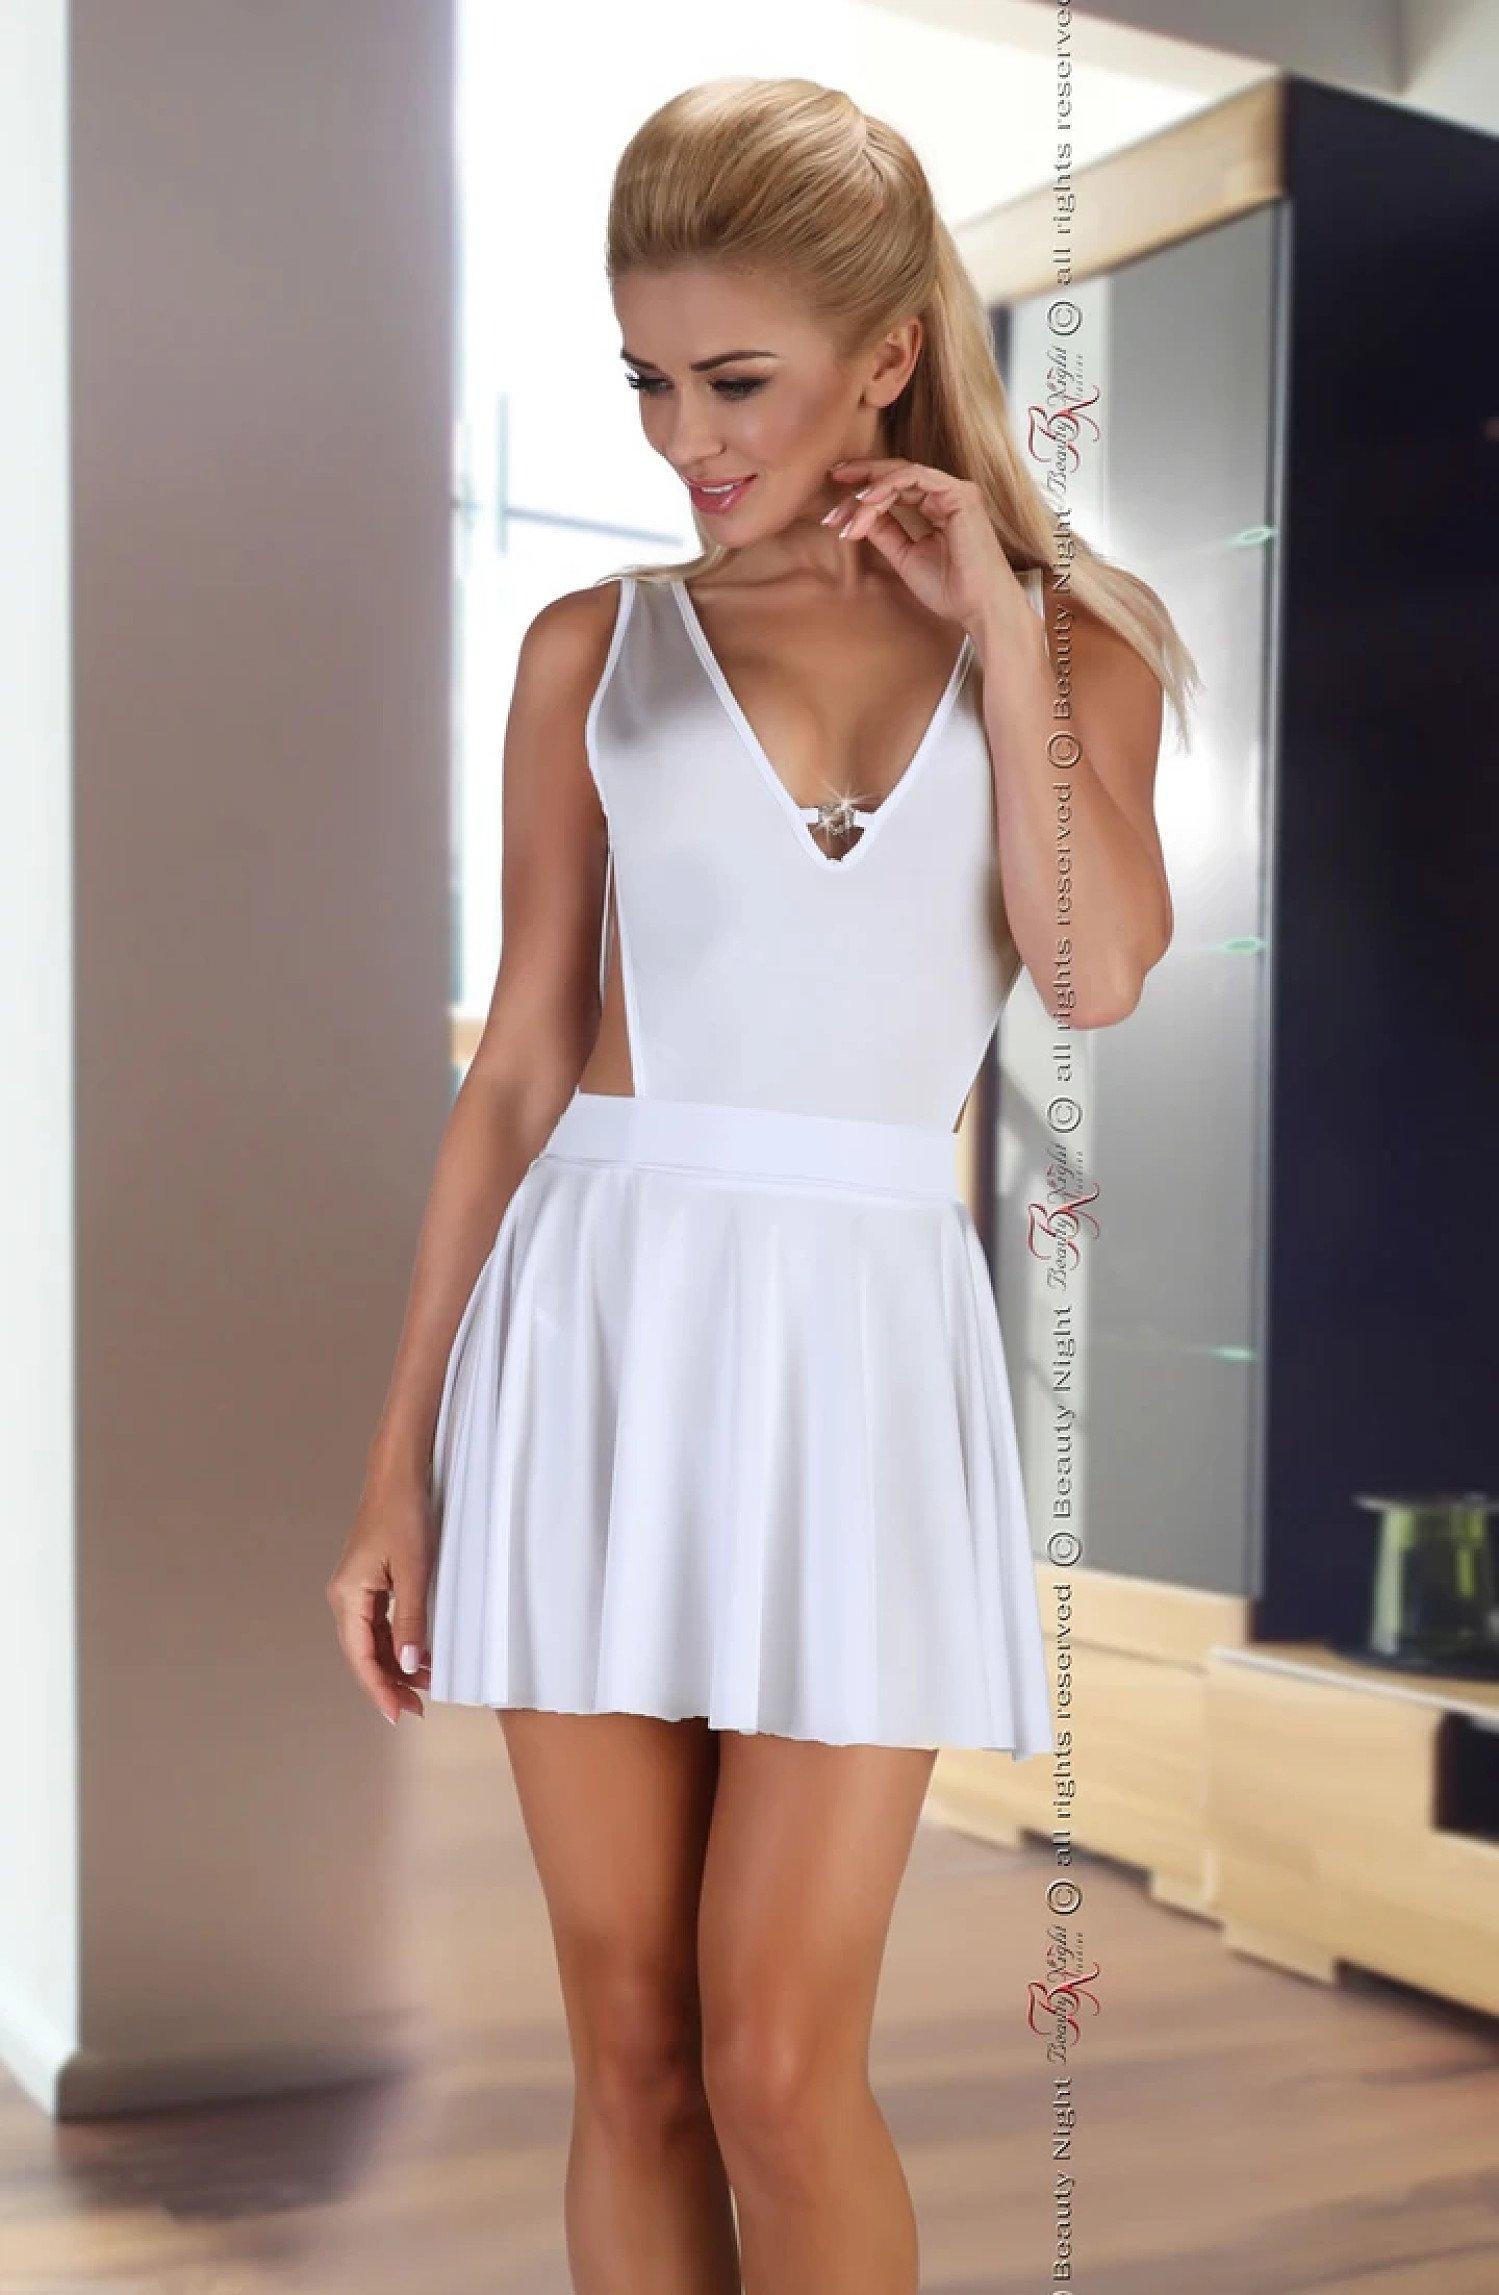 Severine White Dress Free Postage